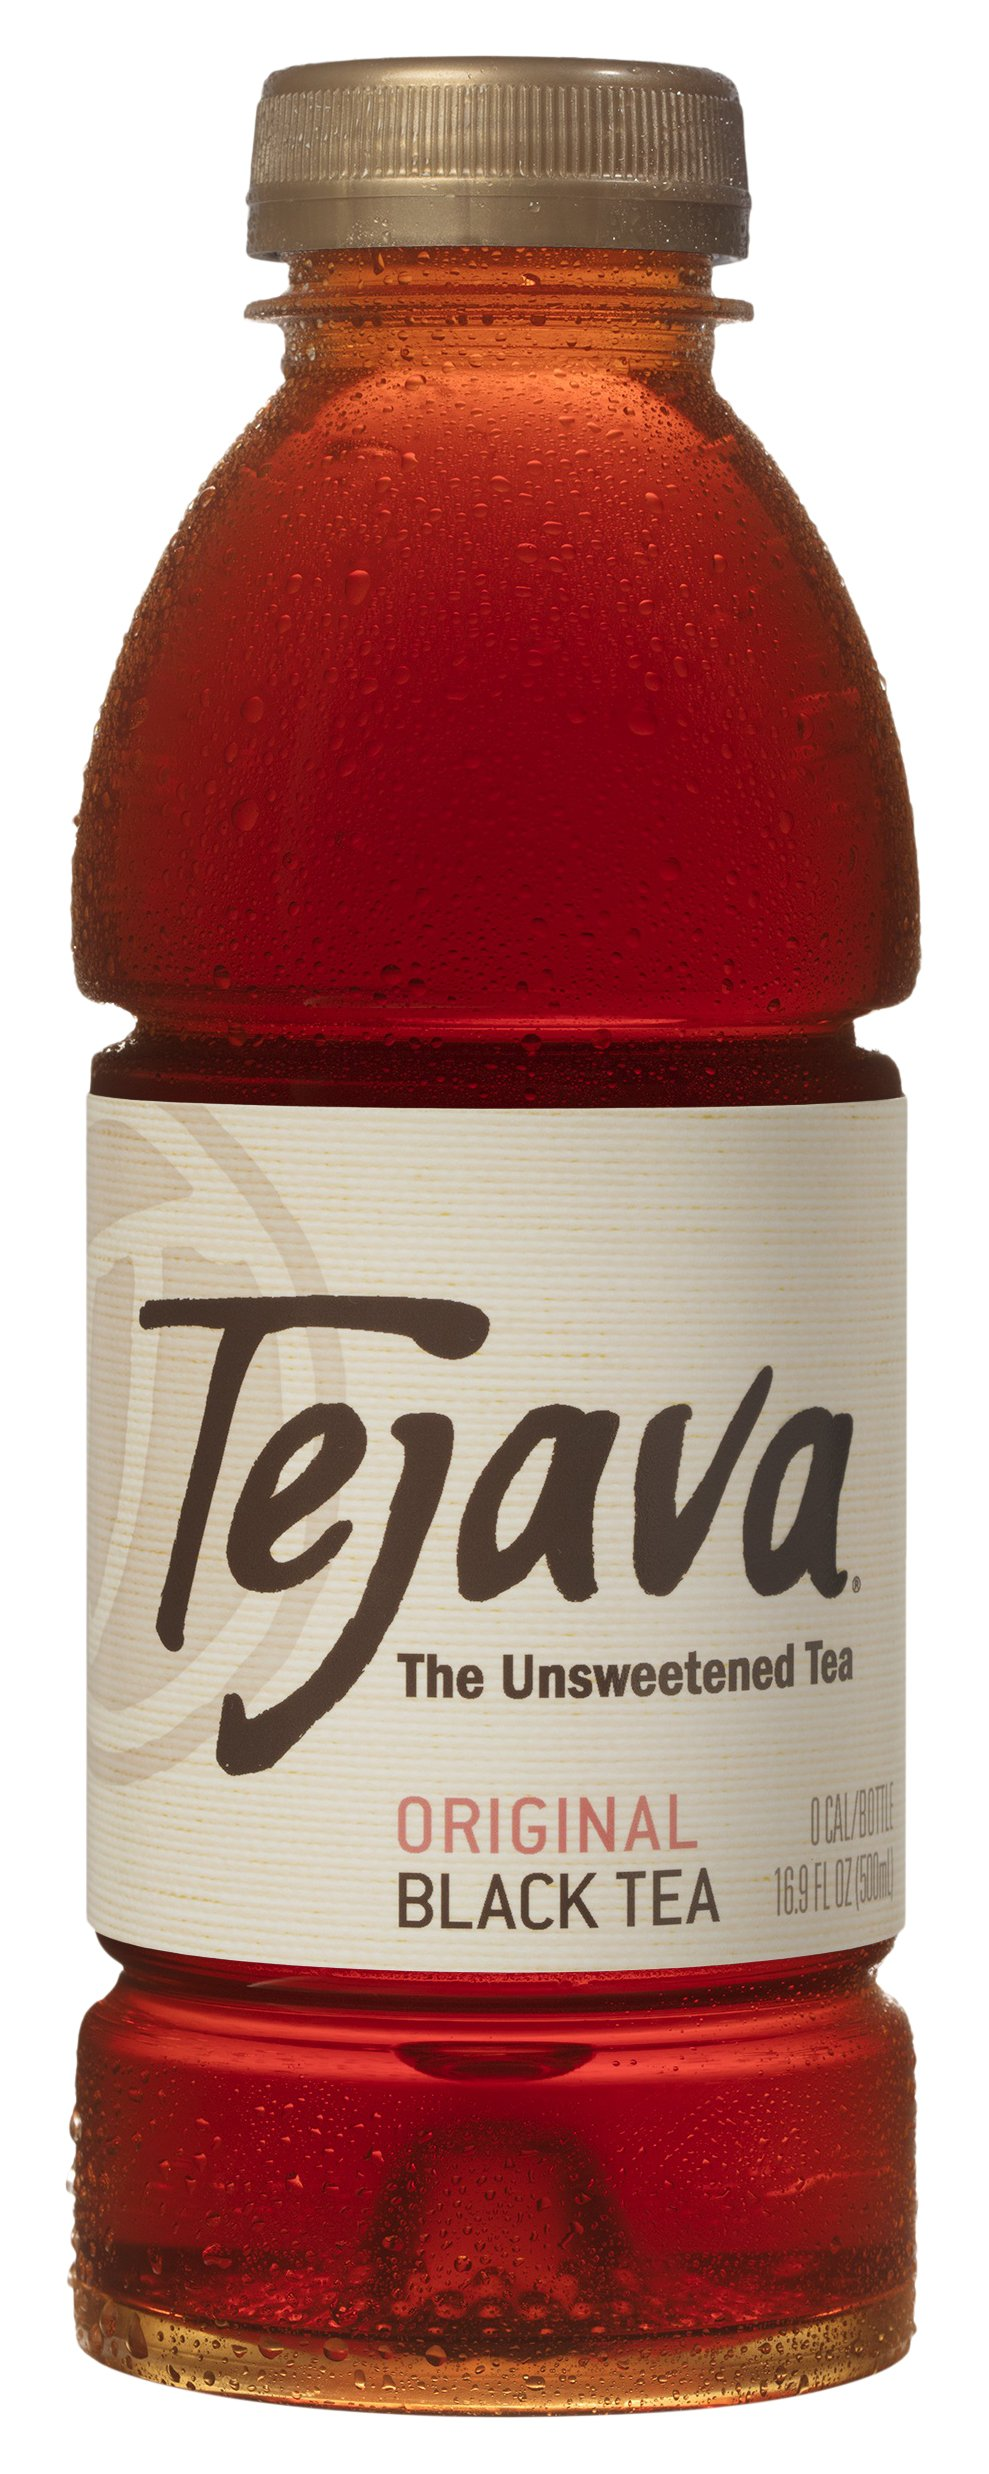 Tejava Original Unsweetened Black Iced Tea, 16.9 Ounce, 12 Count